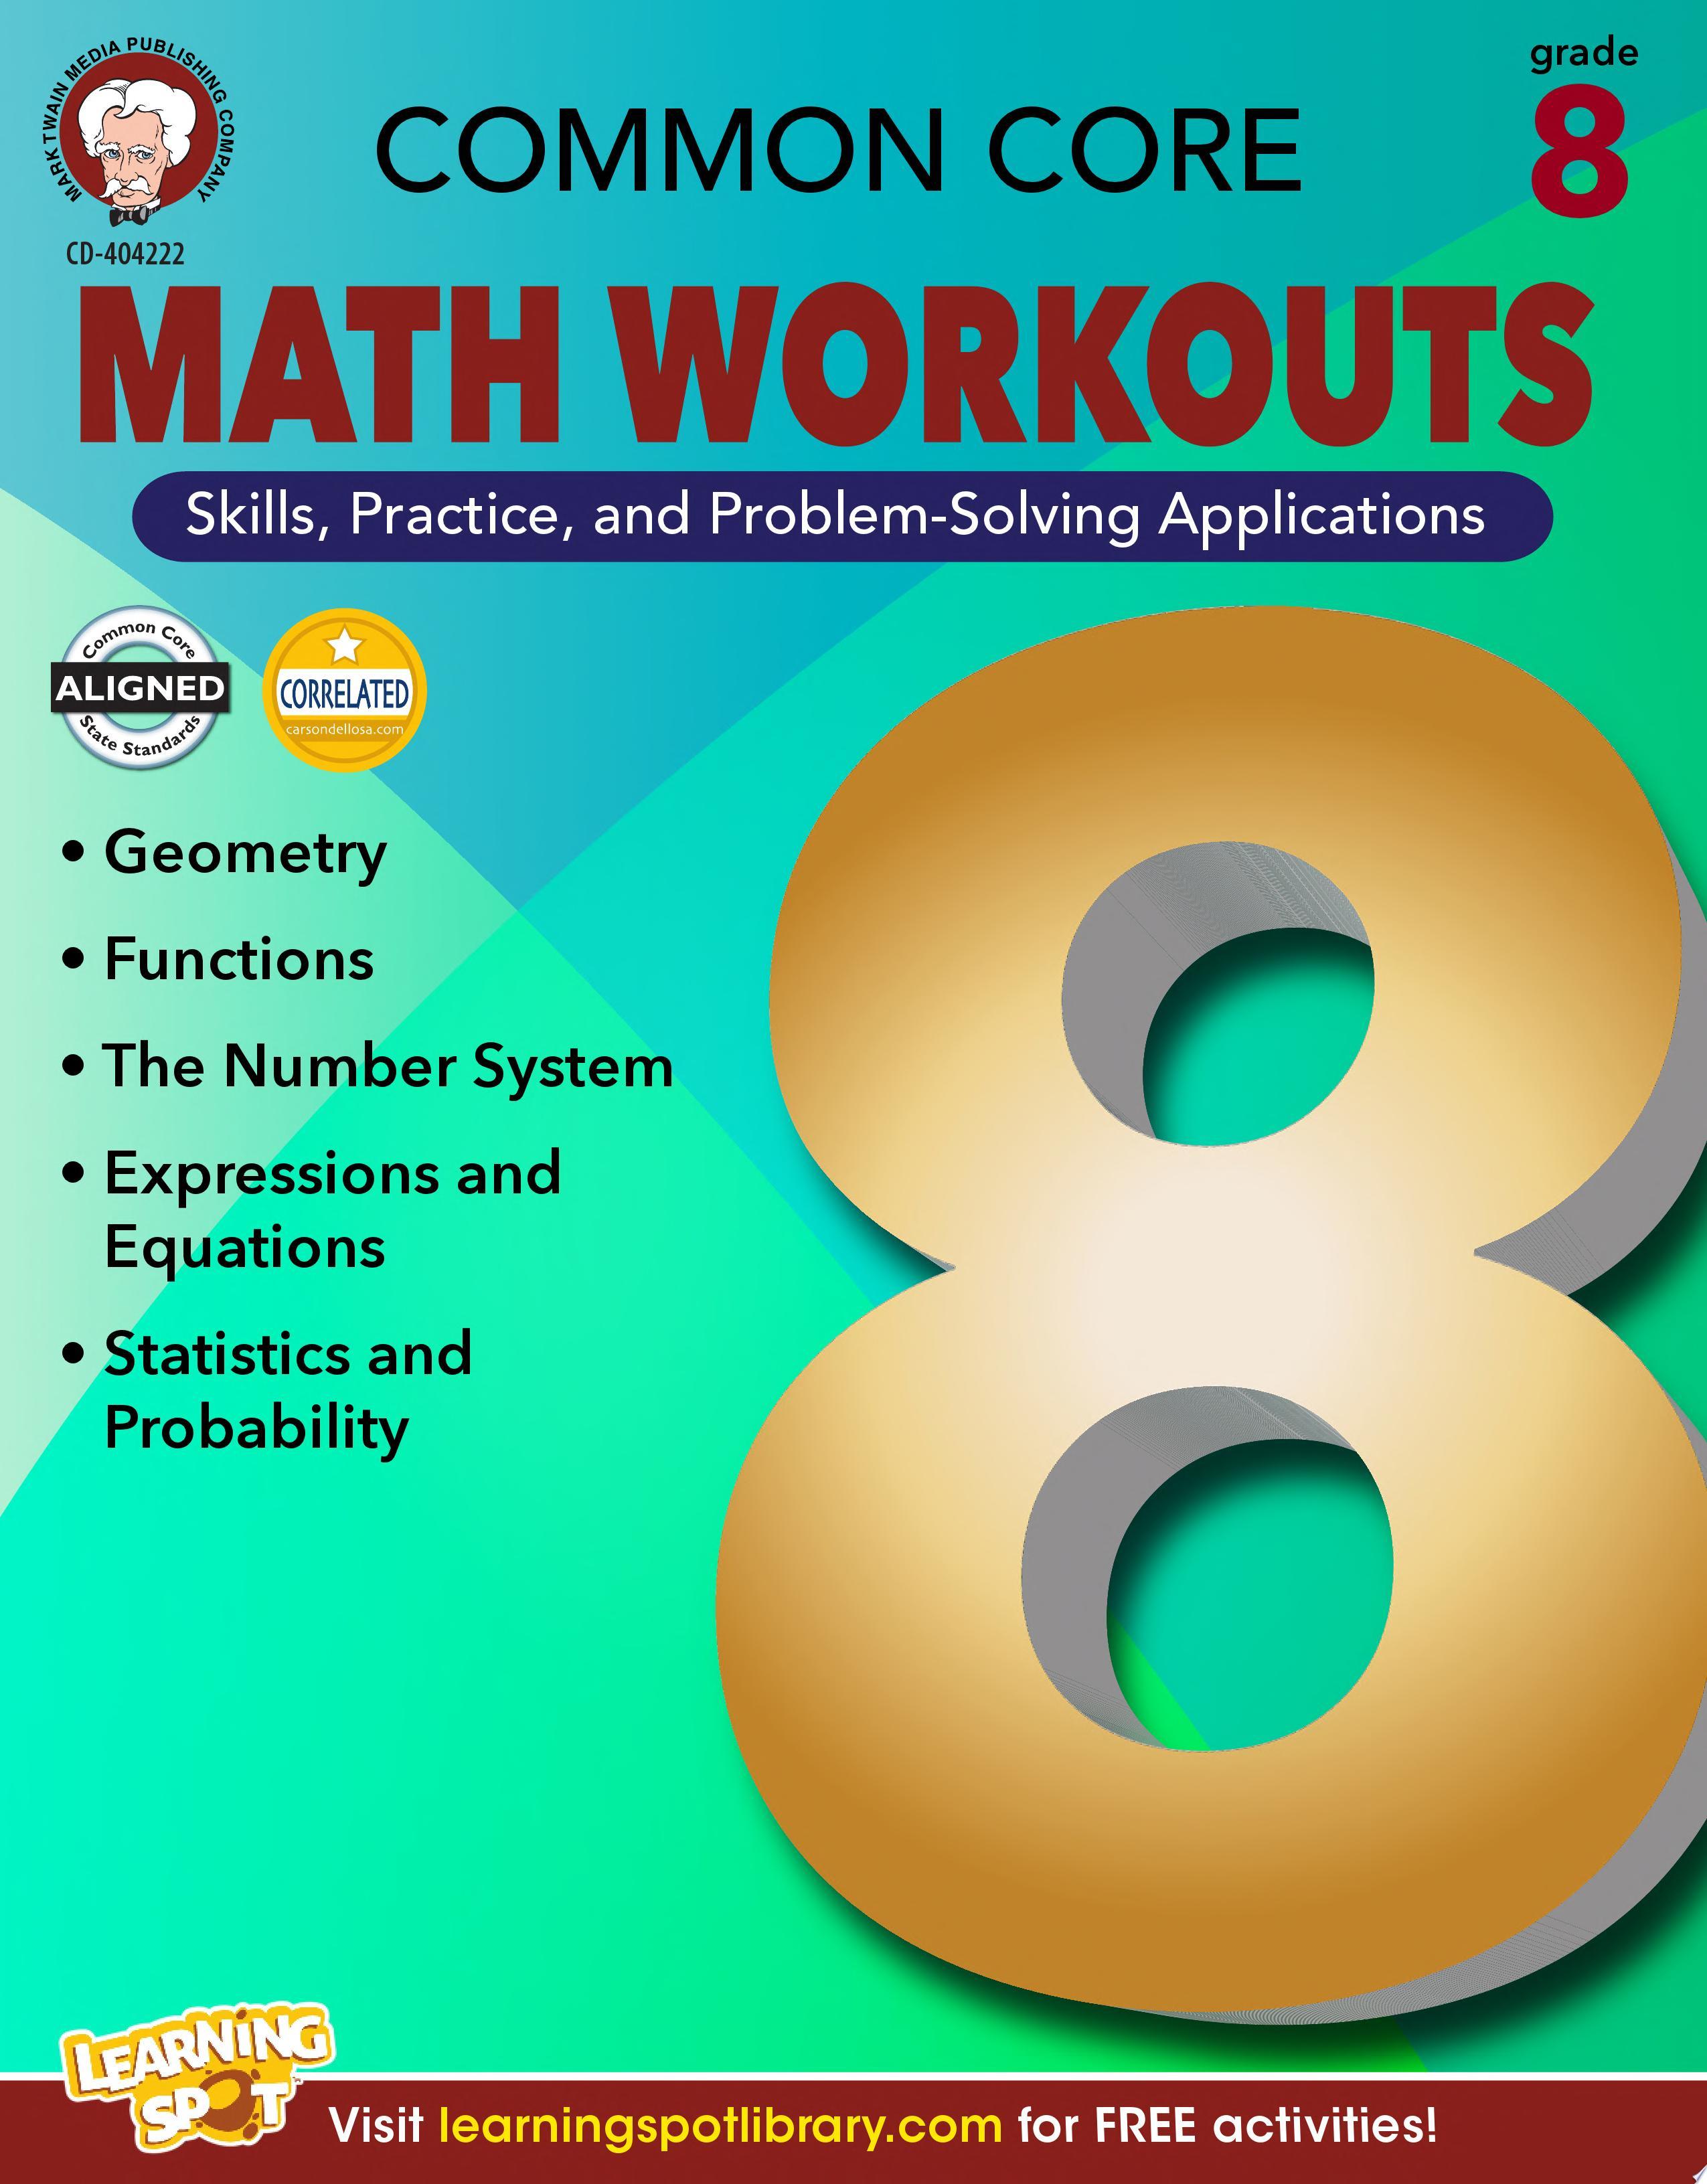 Common Core Math Workouts  Grade 8